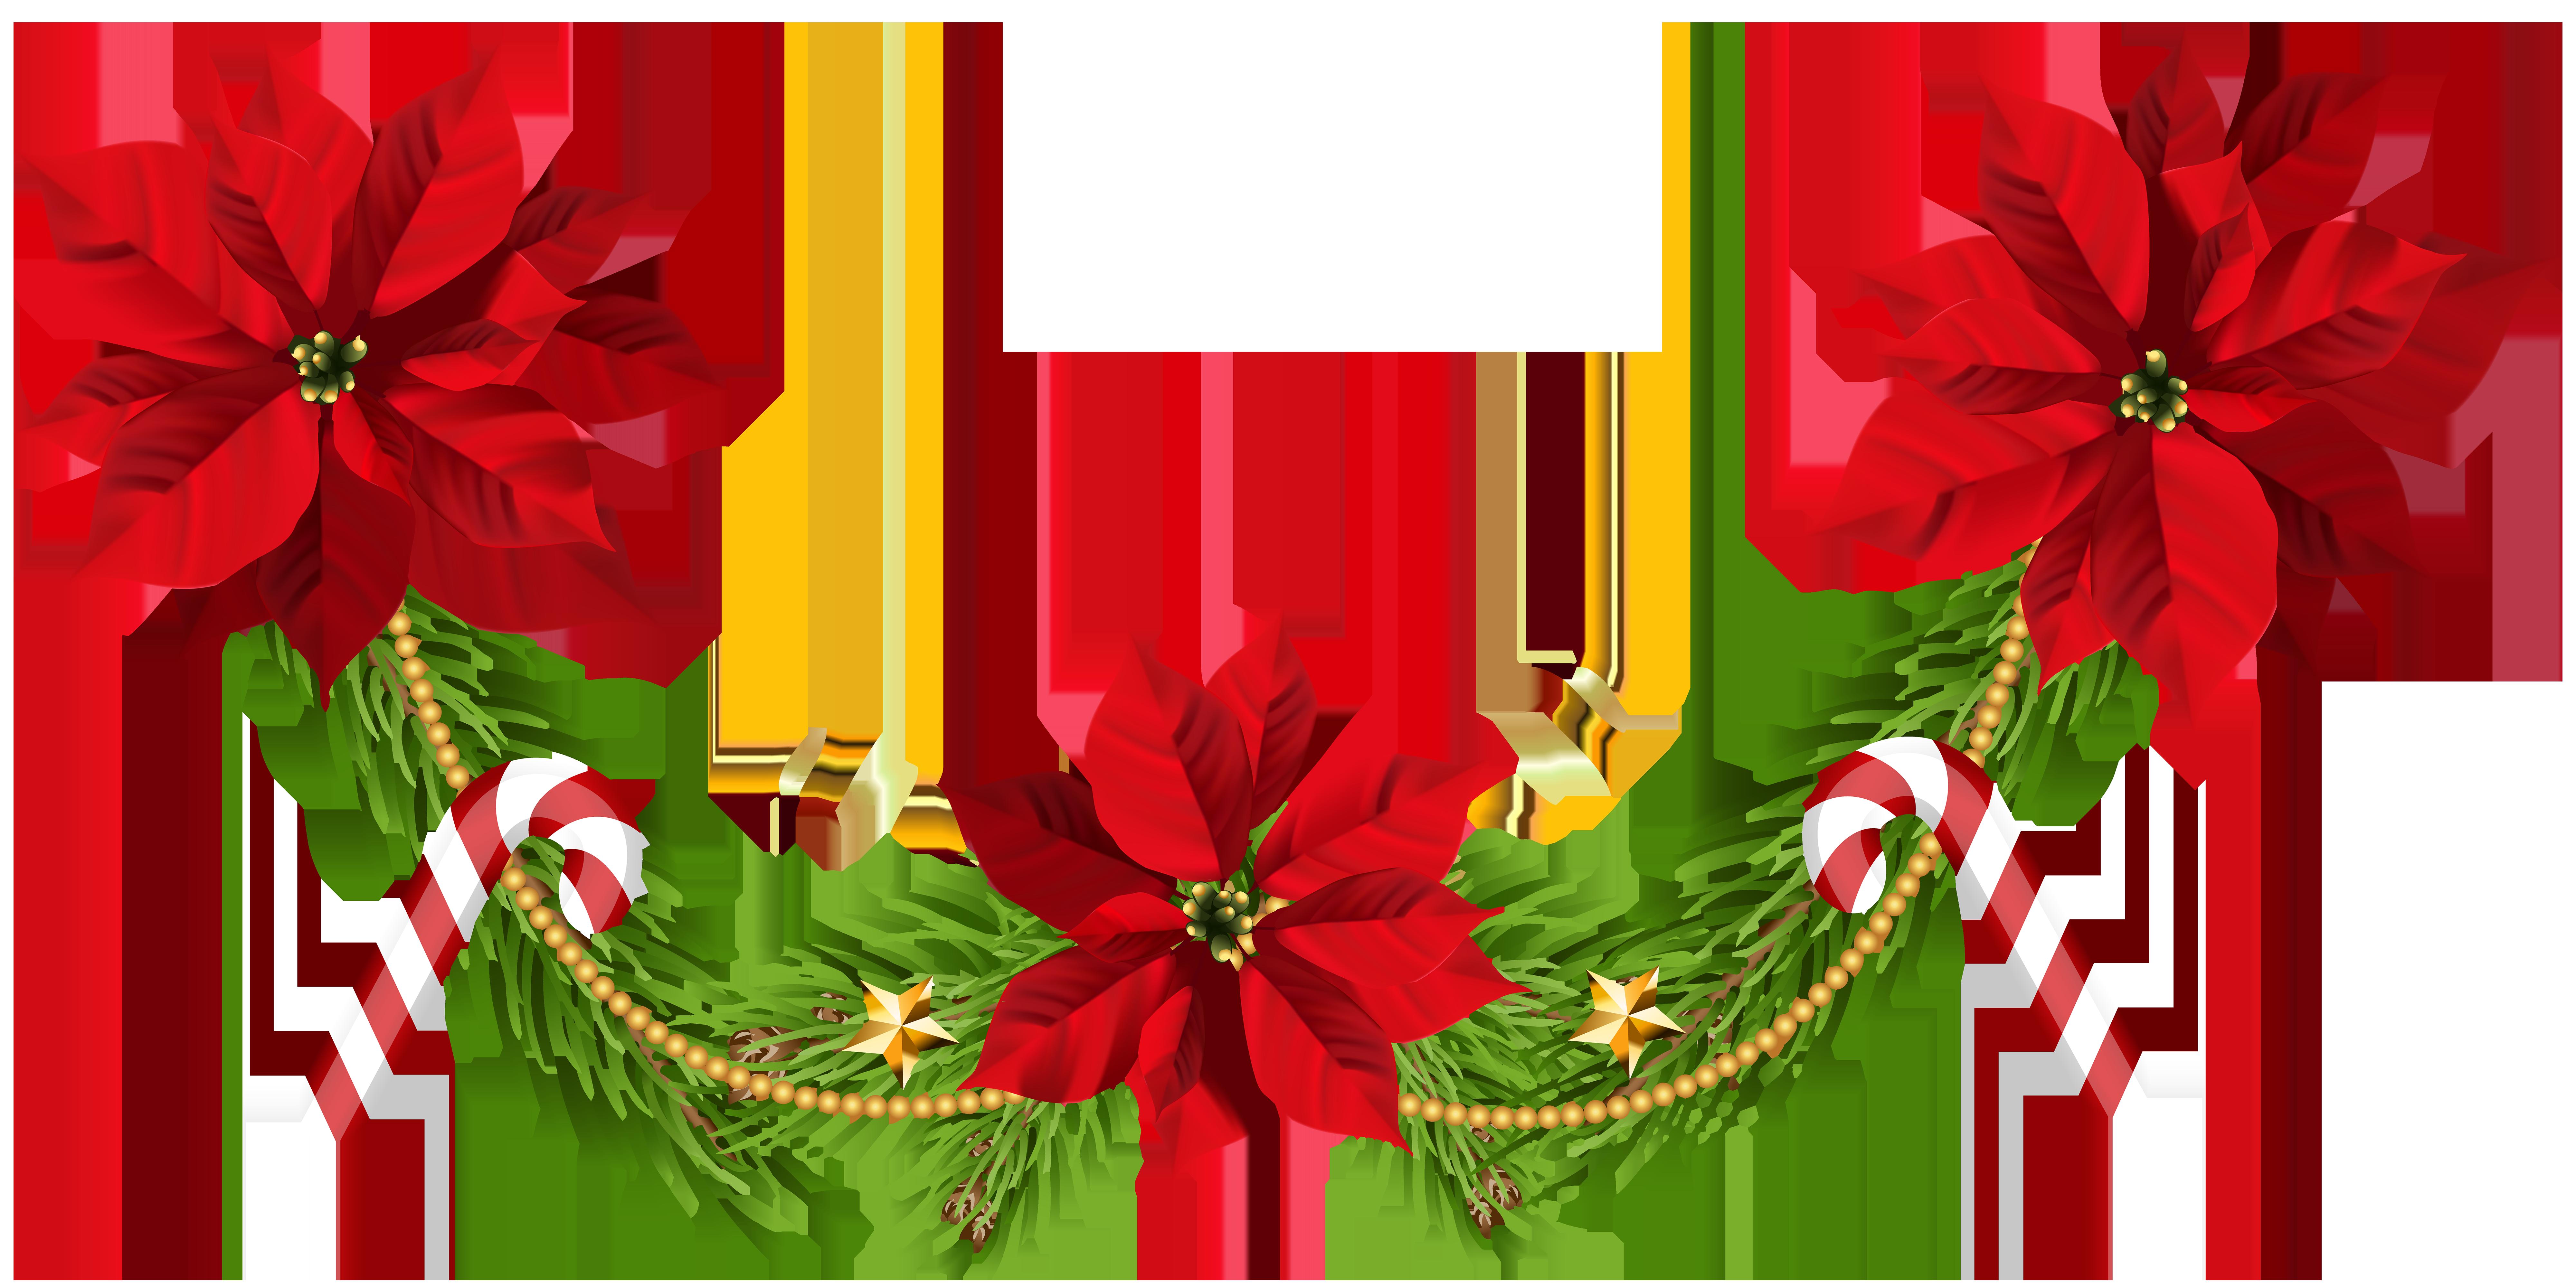 Christmas poinsettias clip art. Garland clipart poinsettia